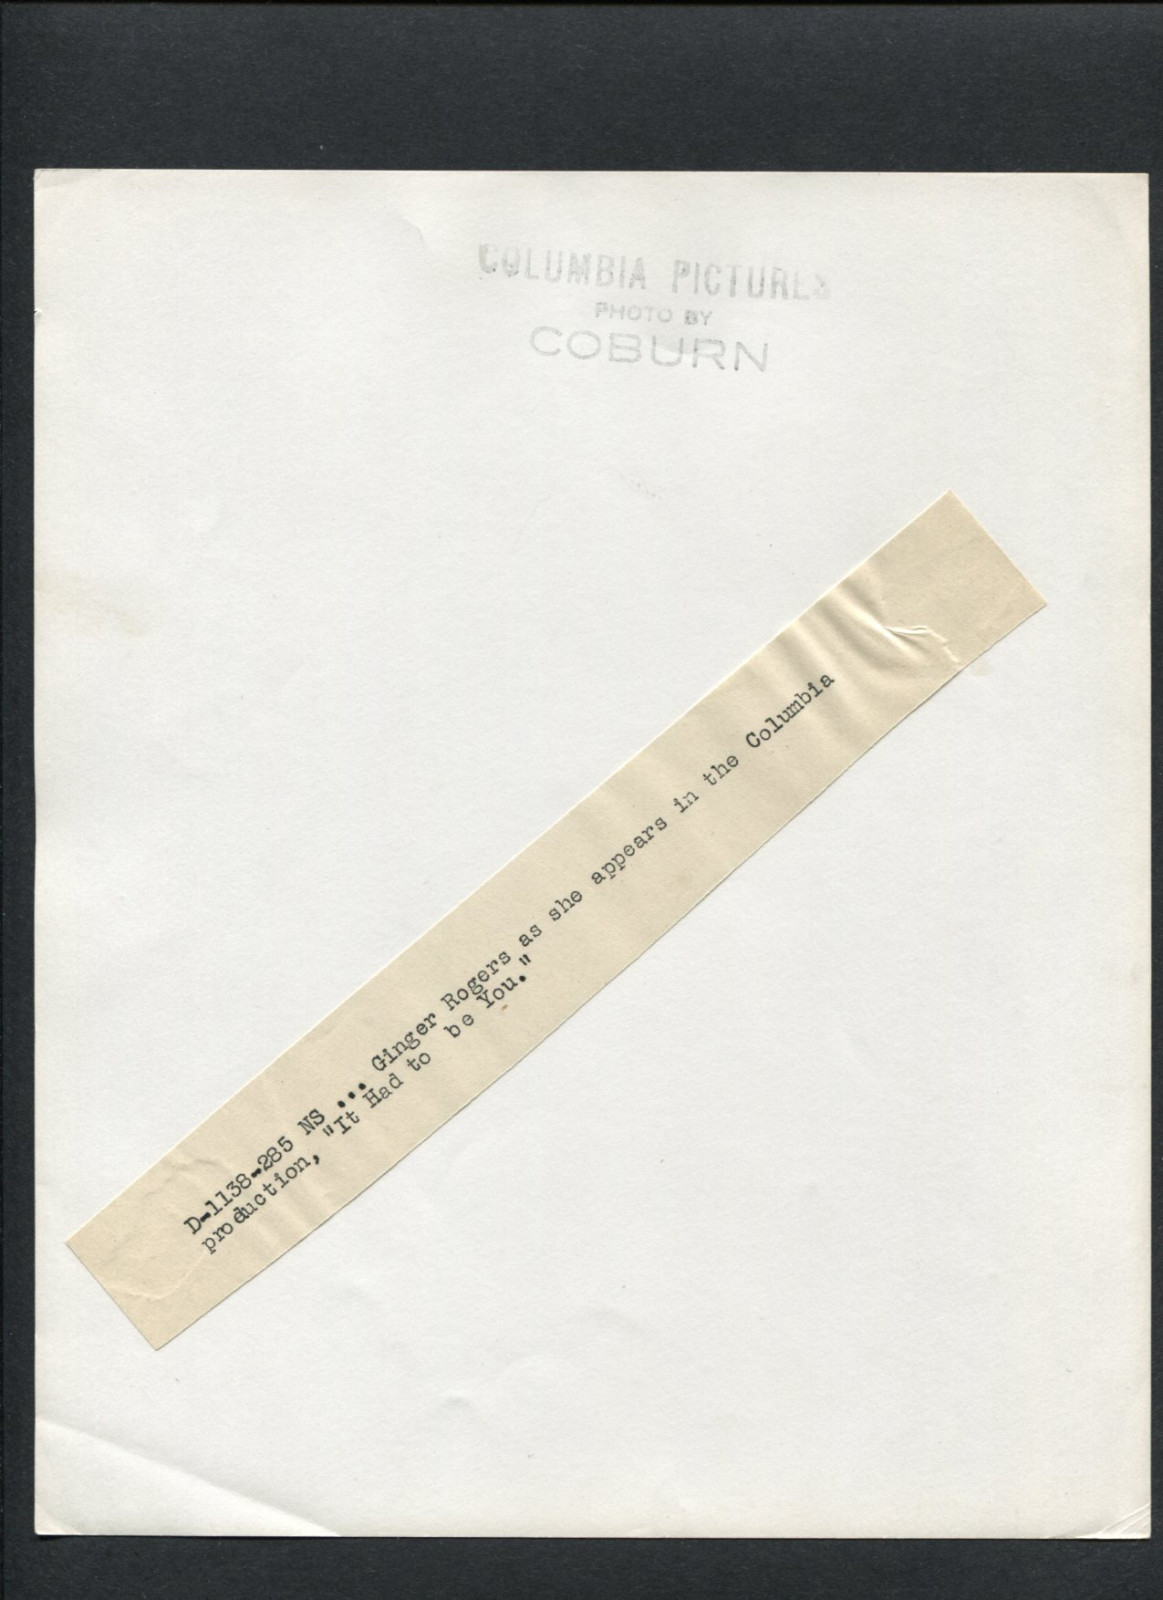 8x10 Print Ginger Rogers 1947 by Robert Coburn #GR663